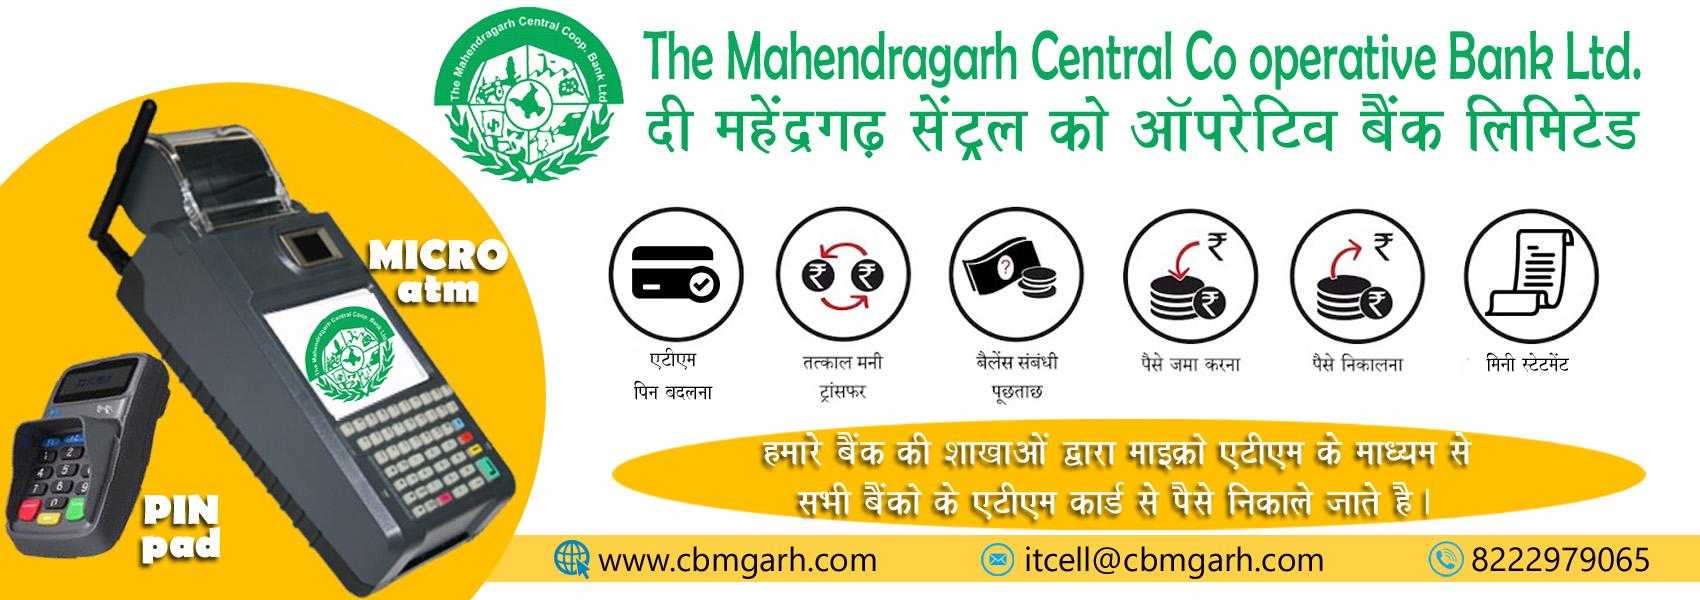 Mahendragarh Central Coop Bank Micro ATM